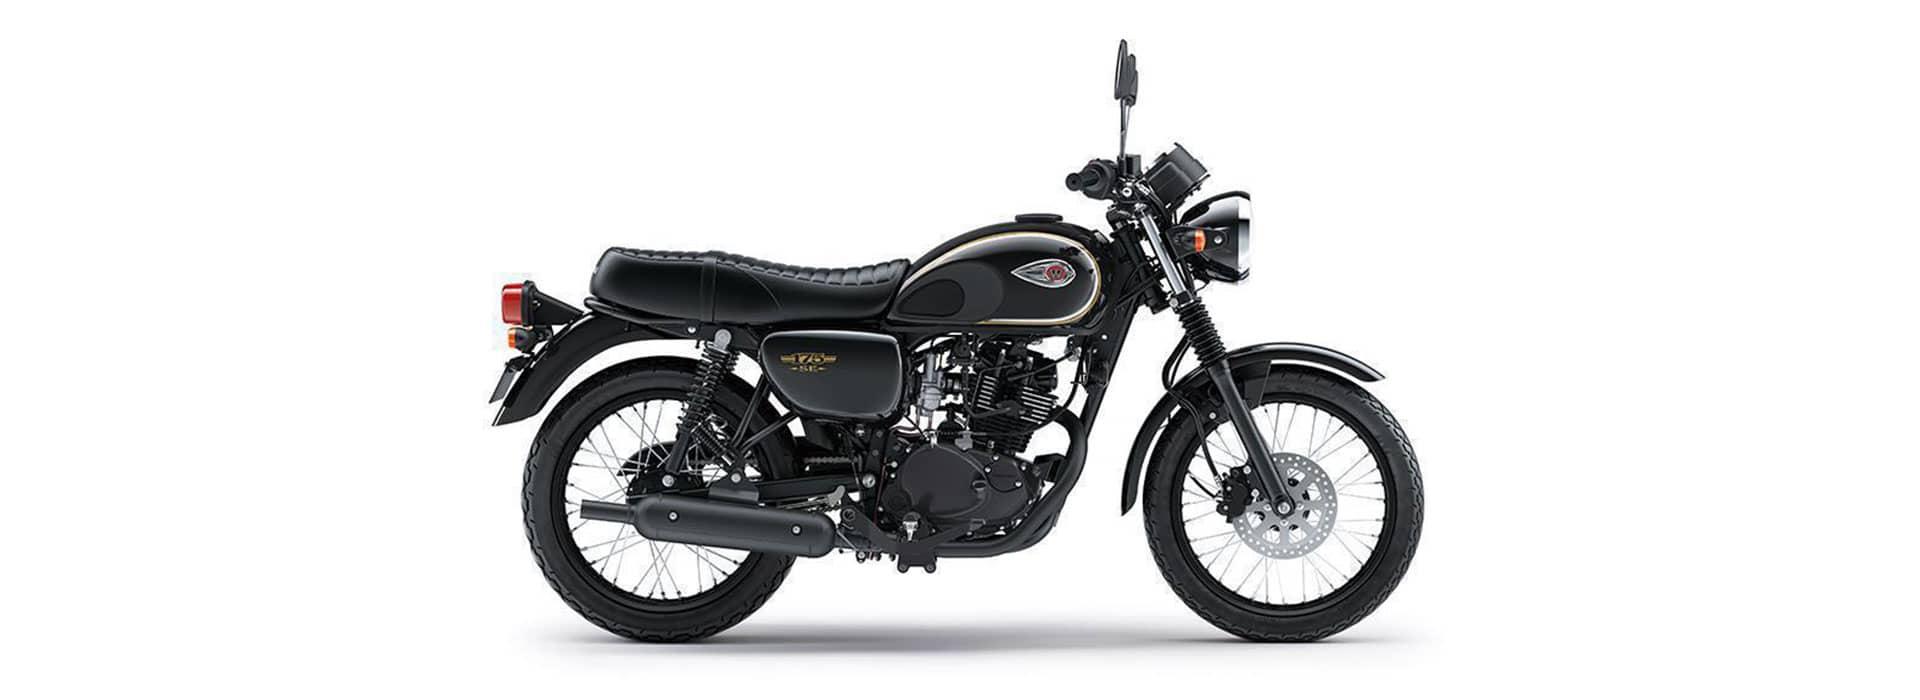 Motor Retro Kawasaki - W175